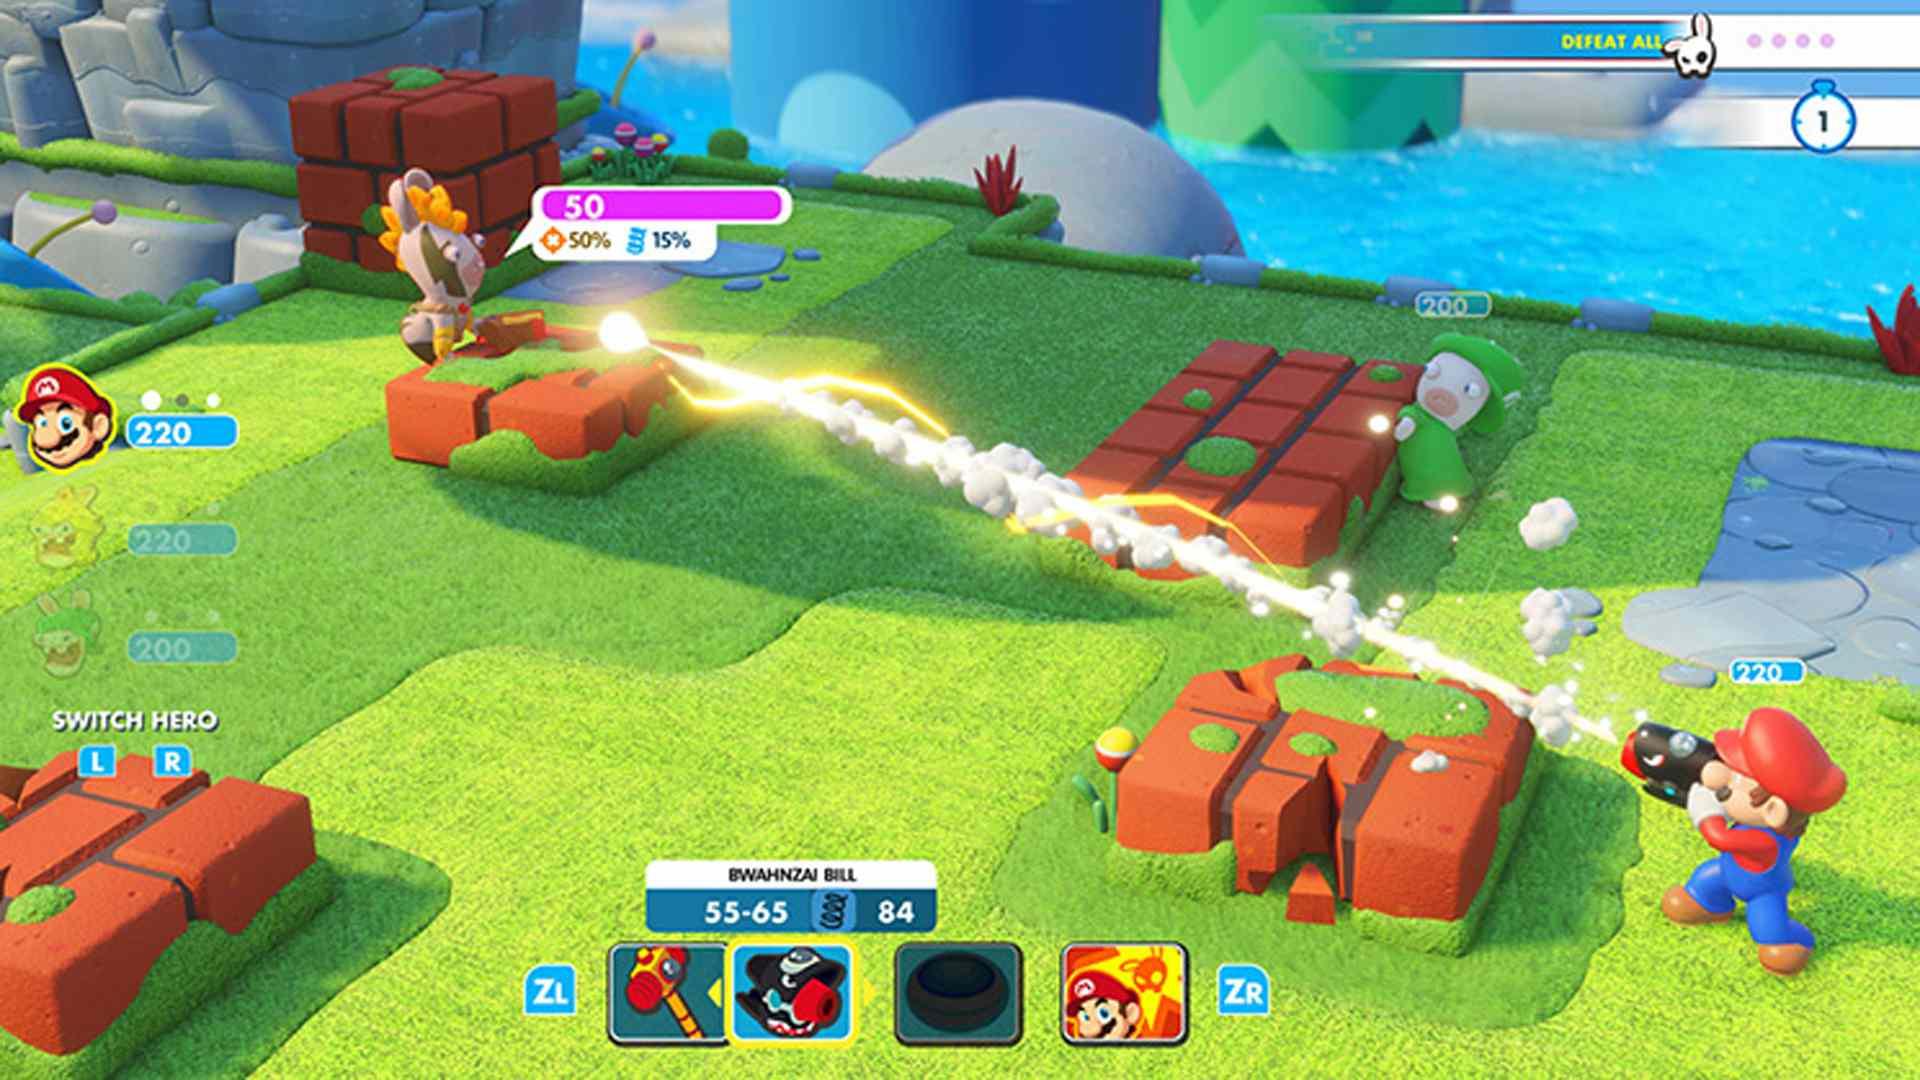 Mario + Rabbids: Kingdom Battle offline strategy video game on Nintendo Switch.